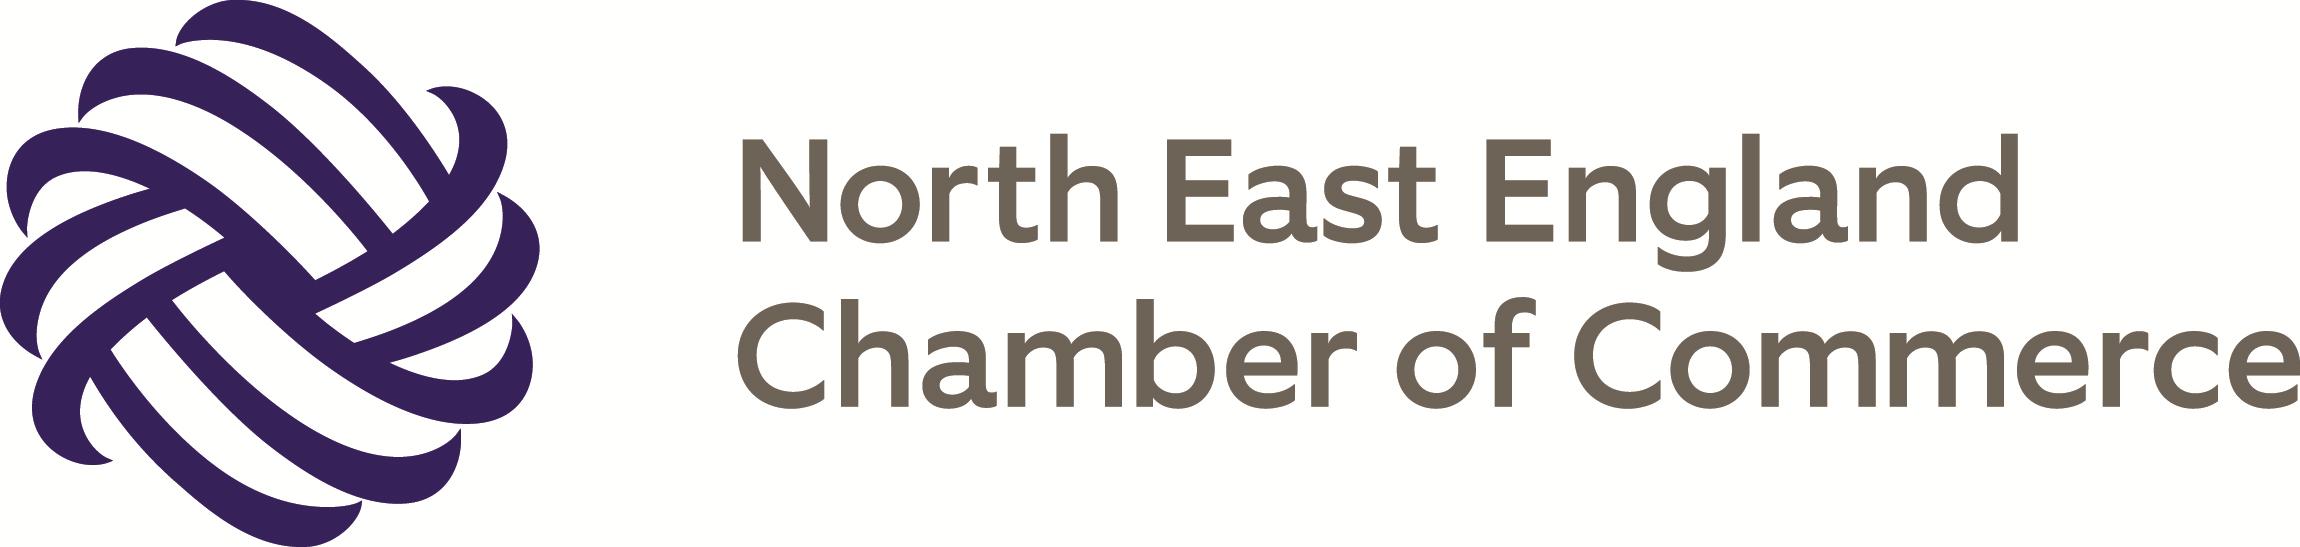 NECC - North East England Chamber of Commerce Logo